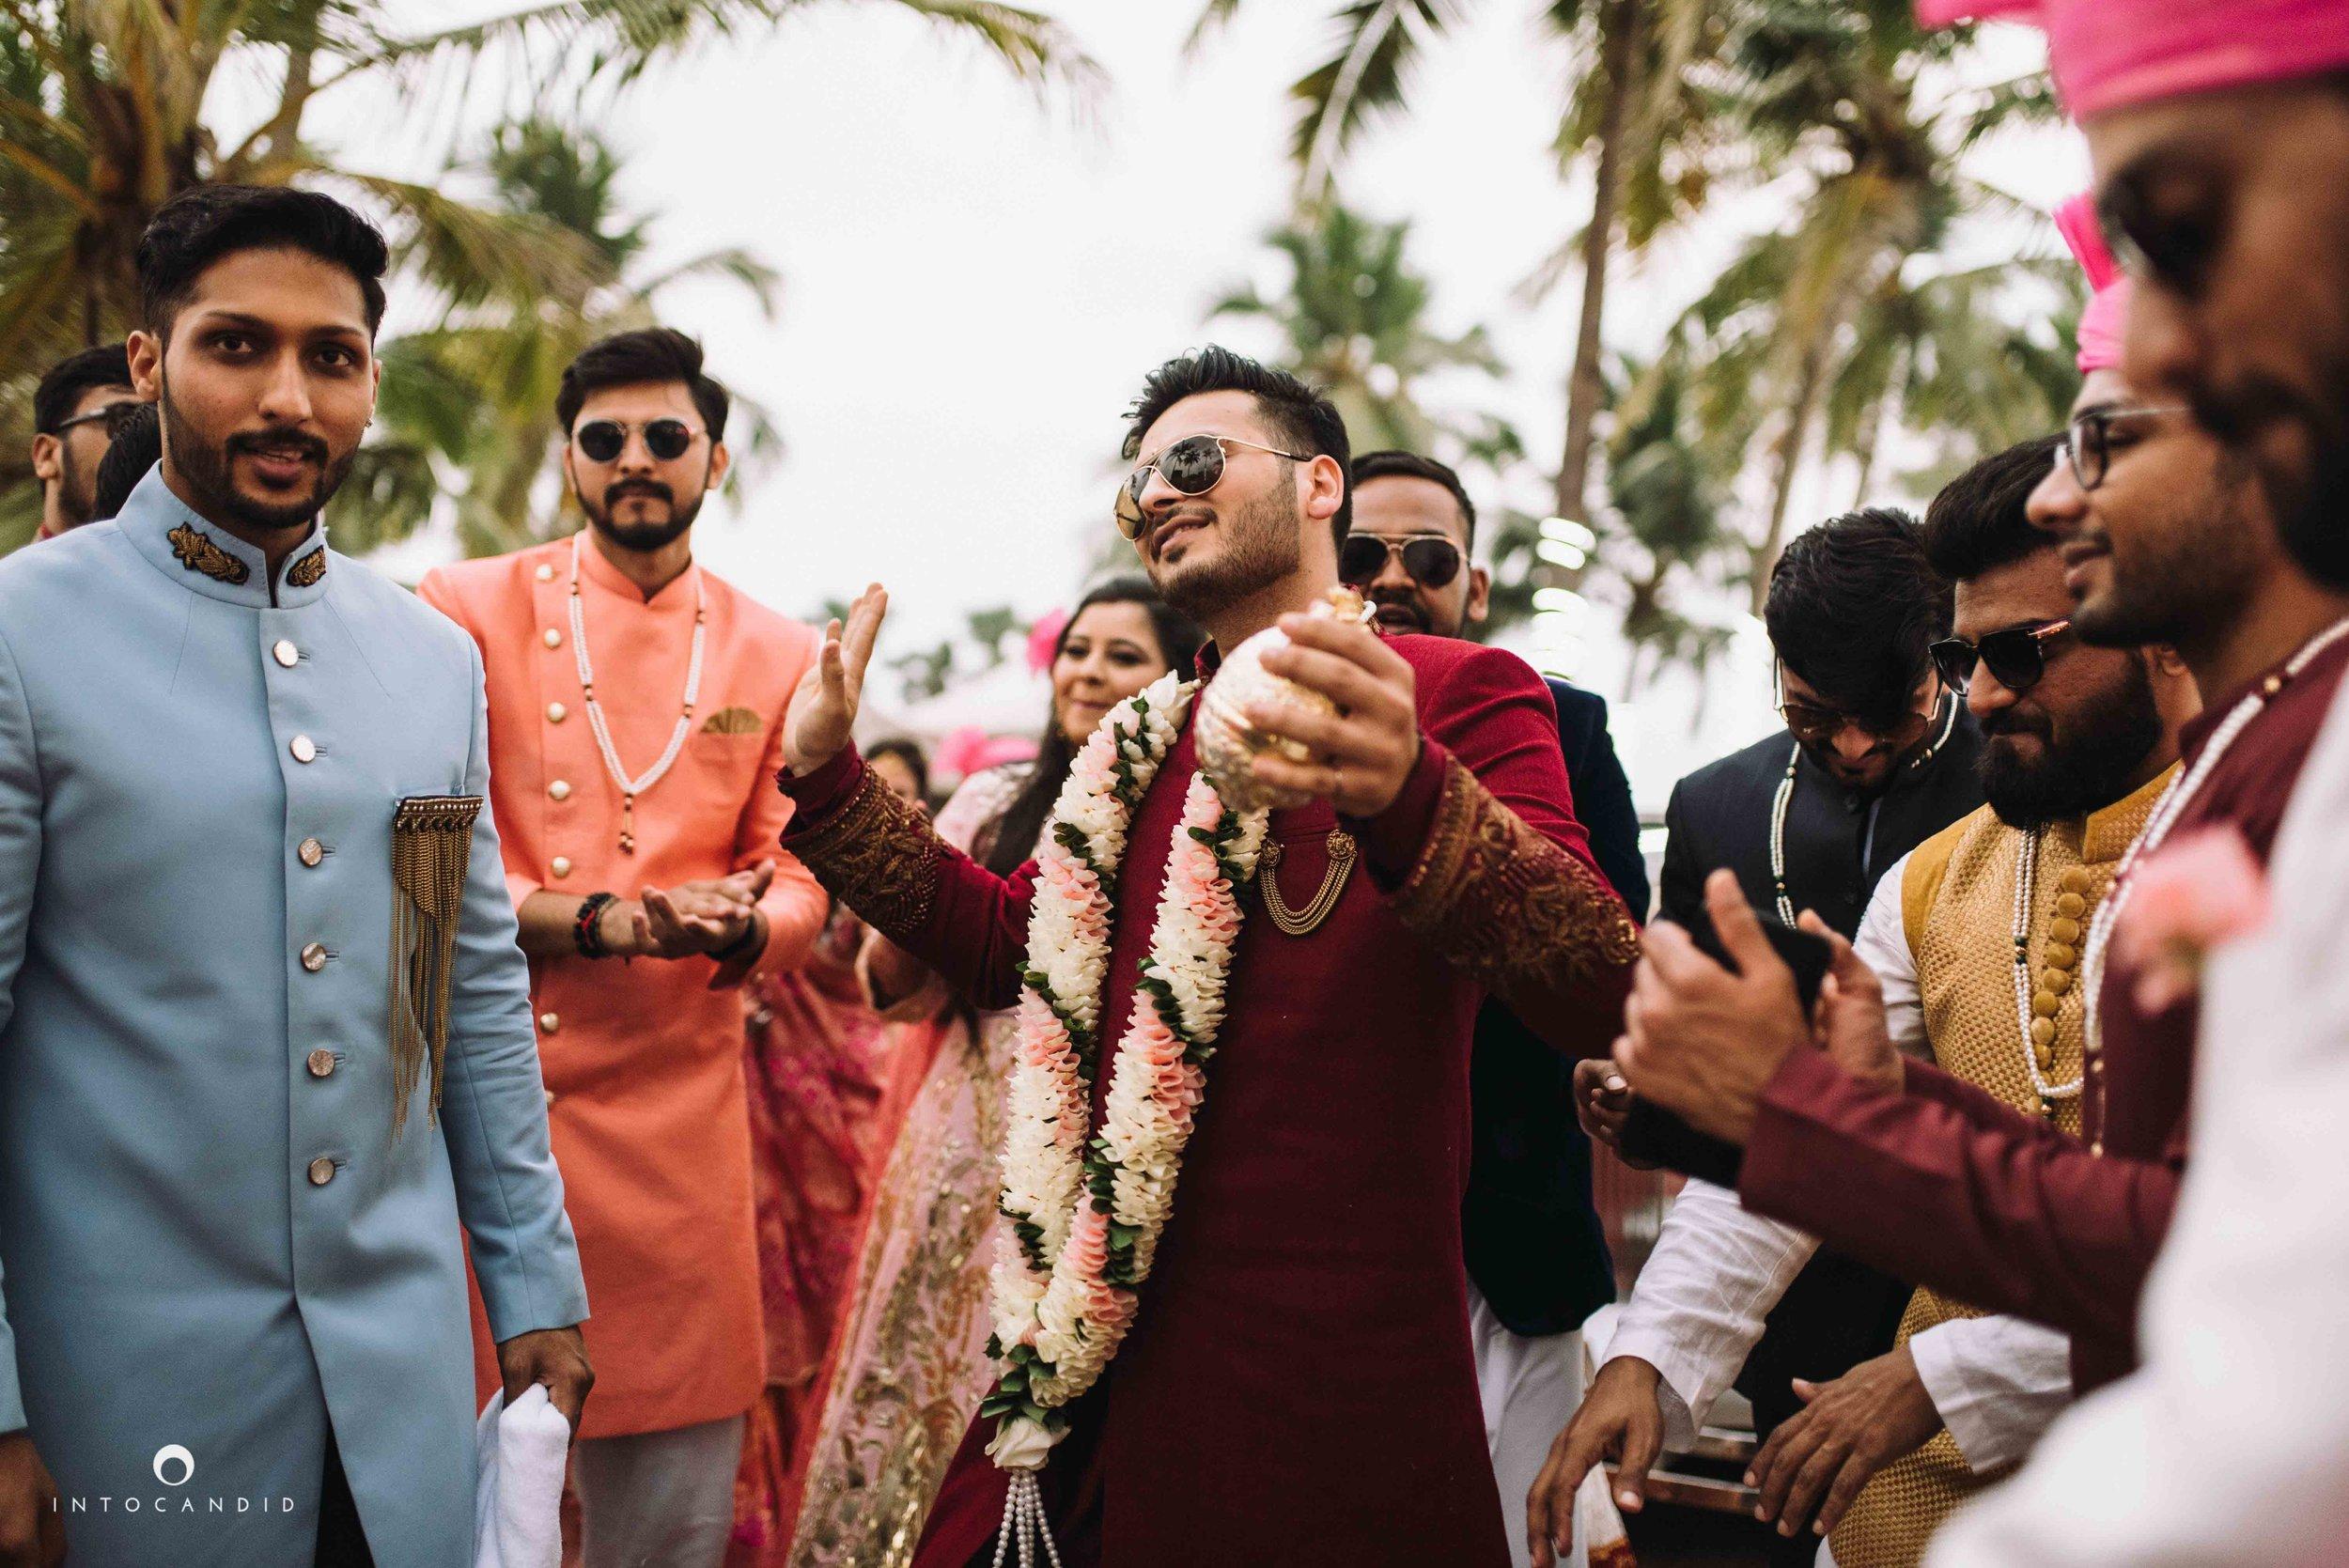 Goa_Wedding_Photographer_Zuri_whitesands_094.jpg